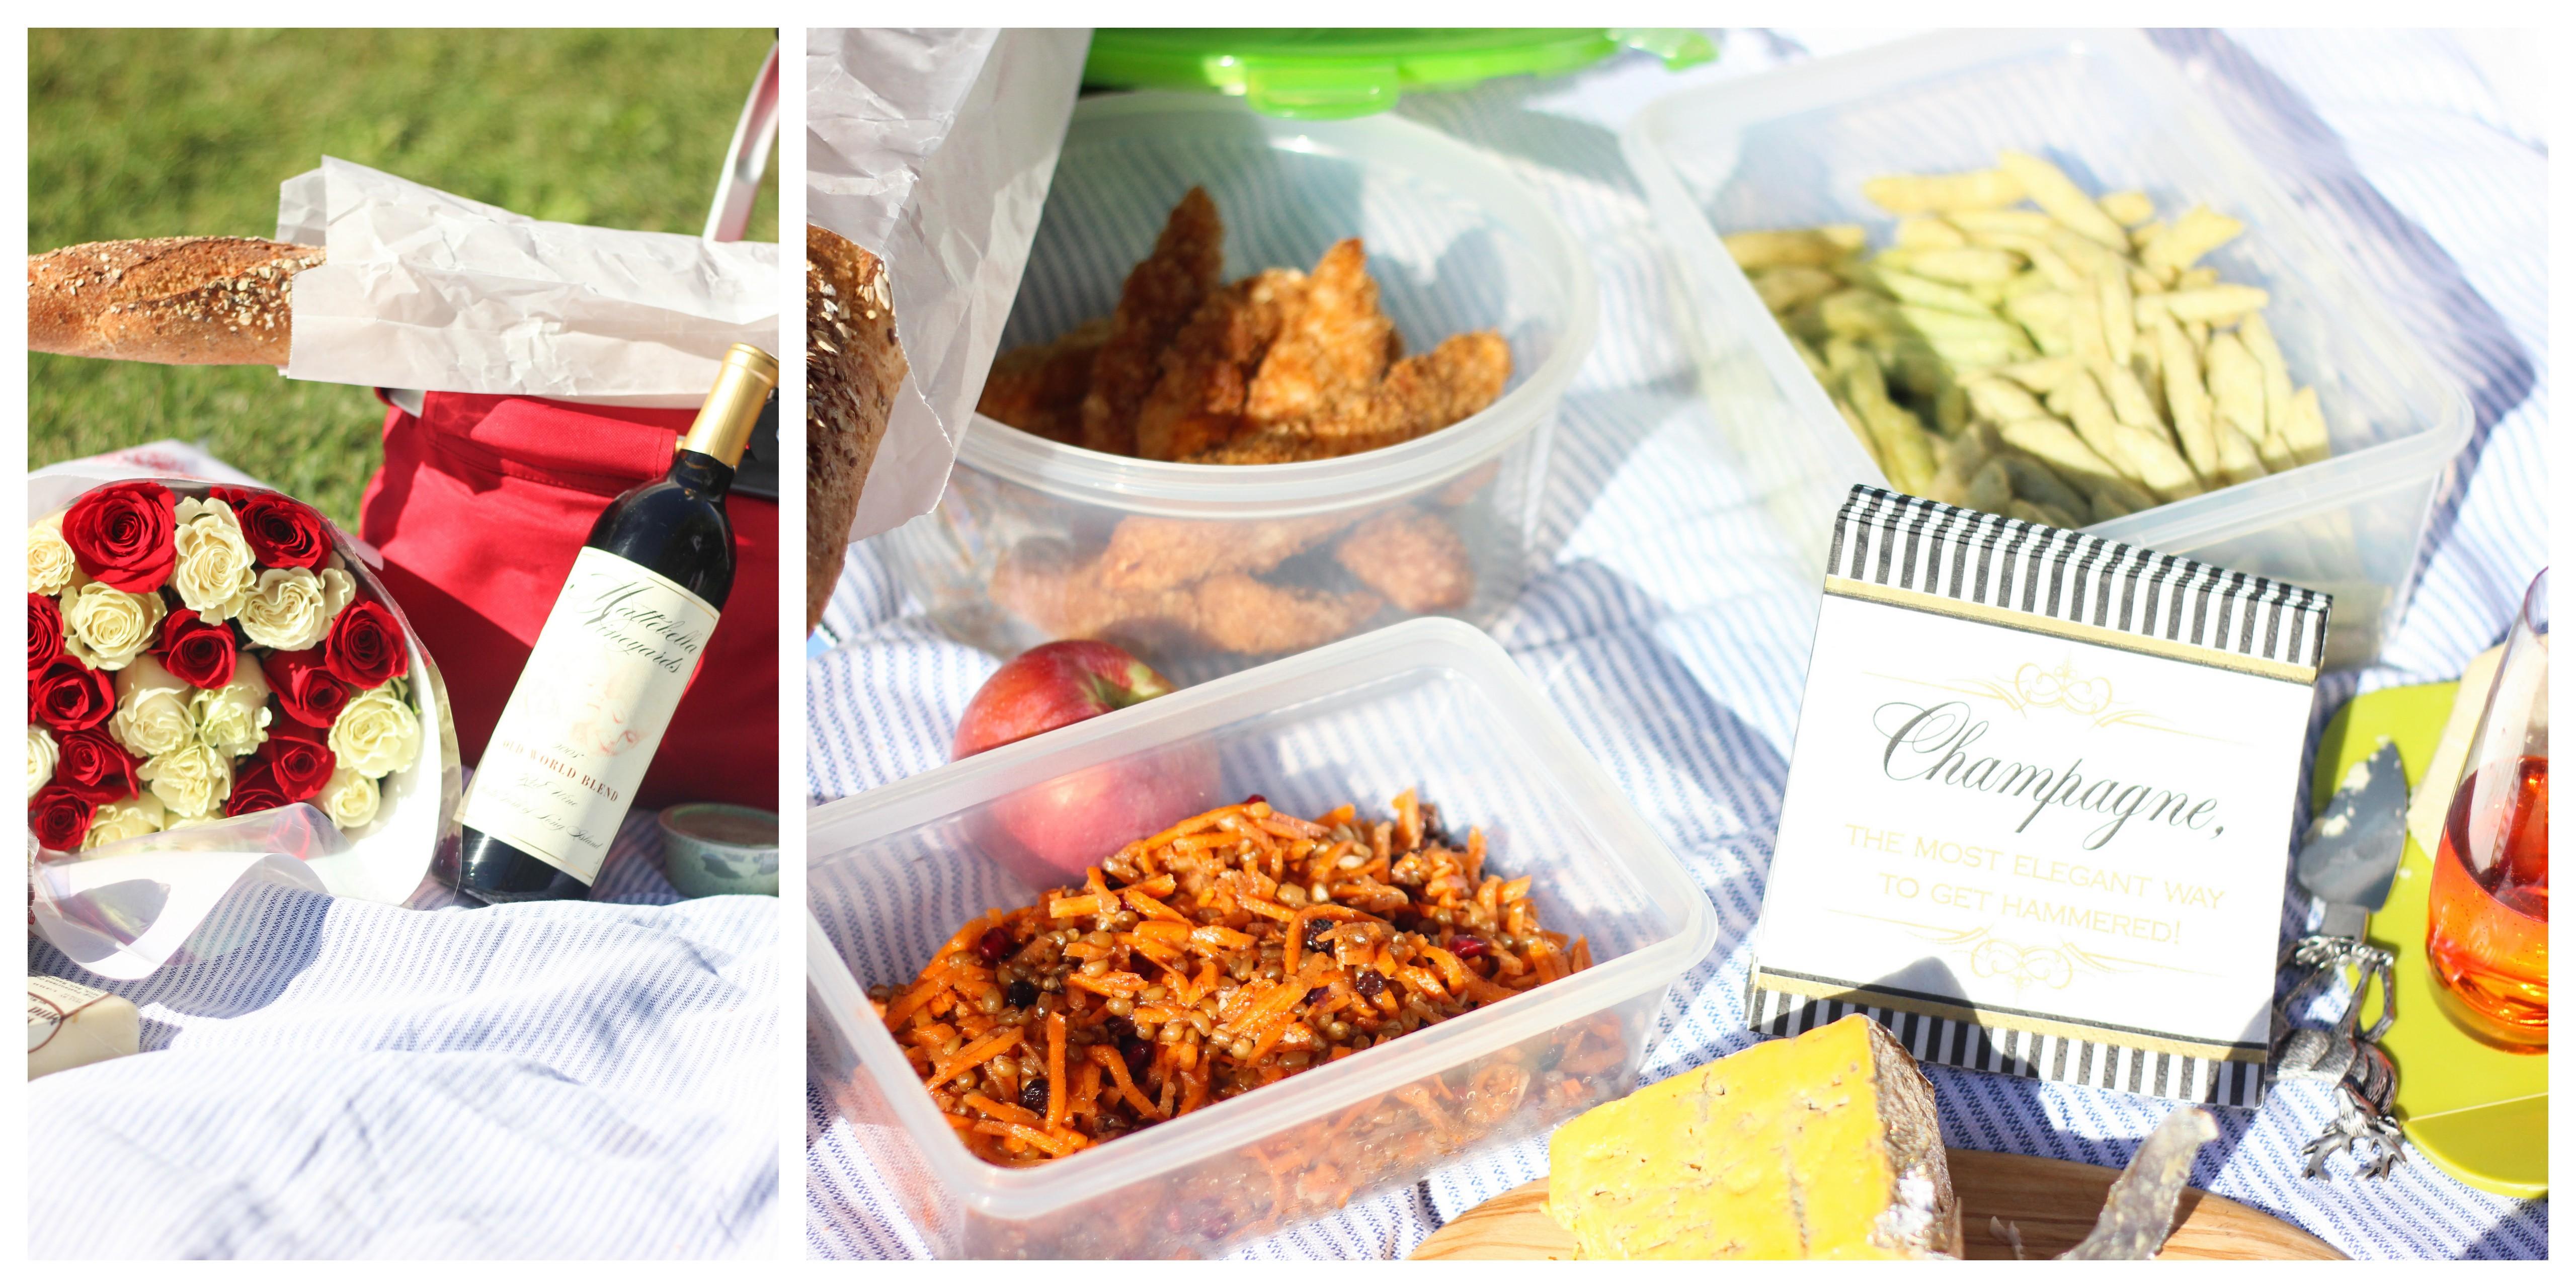 shein-picnic-edited-002